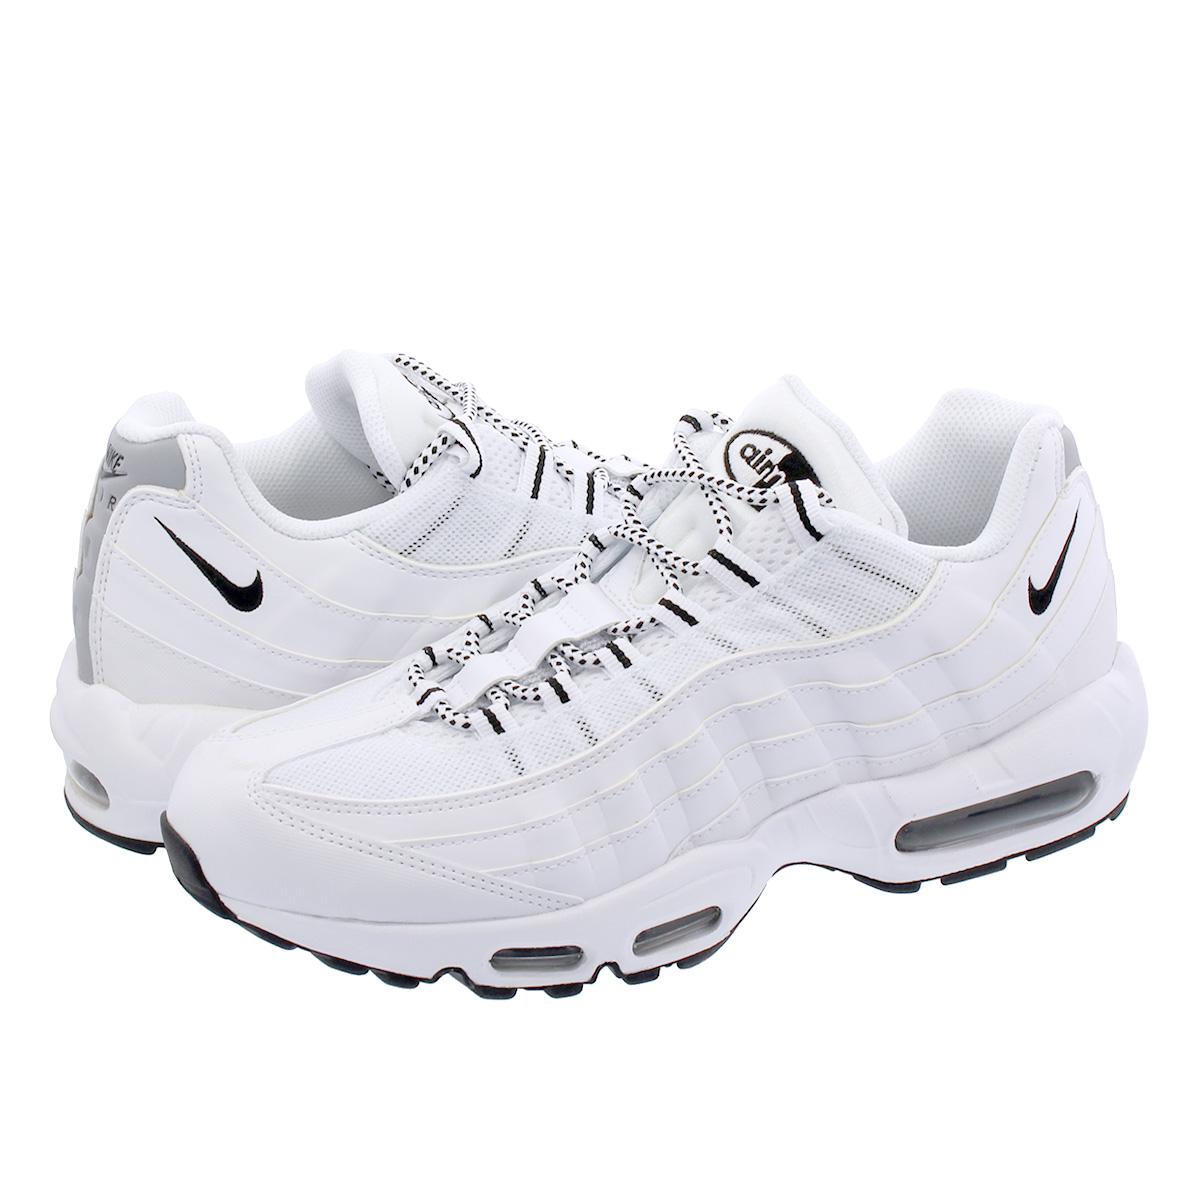 Nike Air Max 95 White Black Black | 609048 109